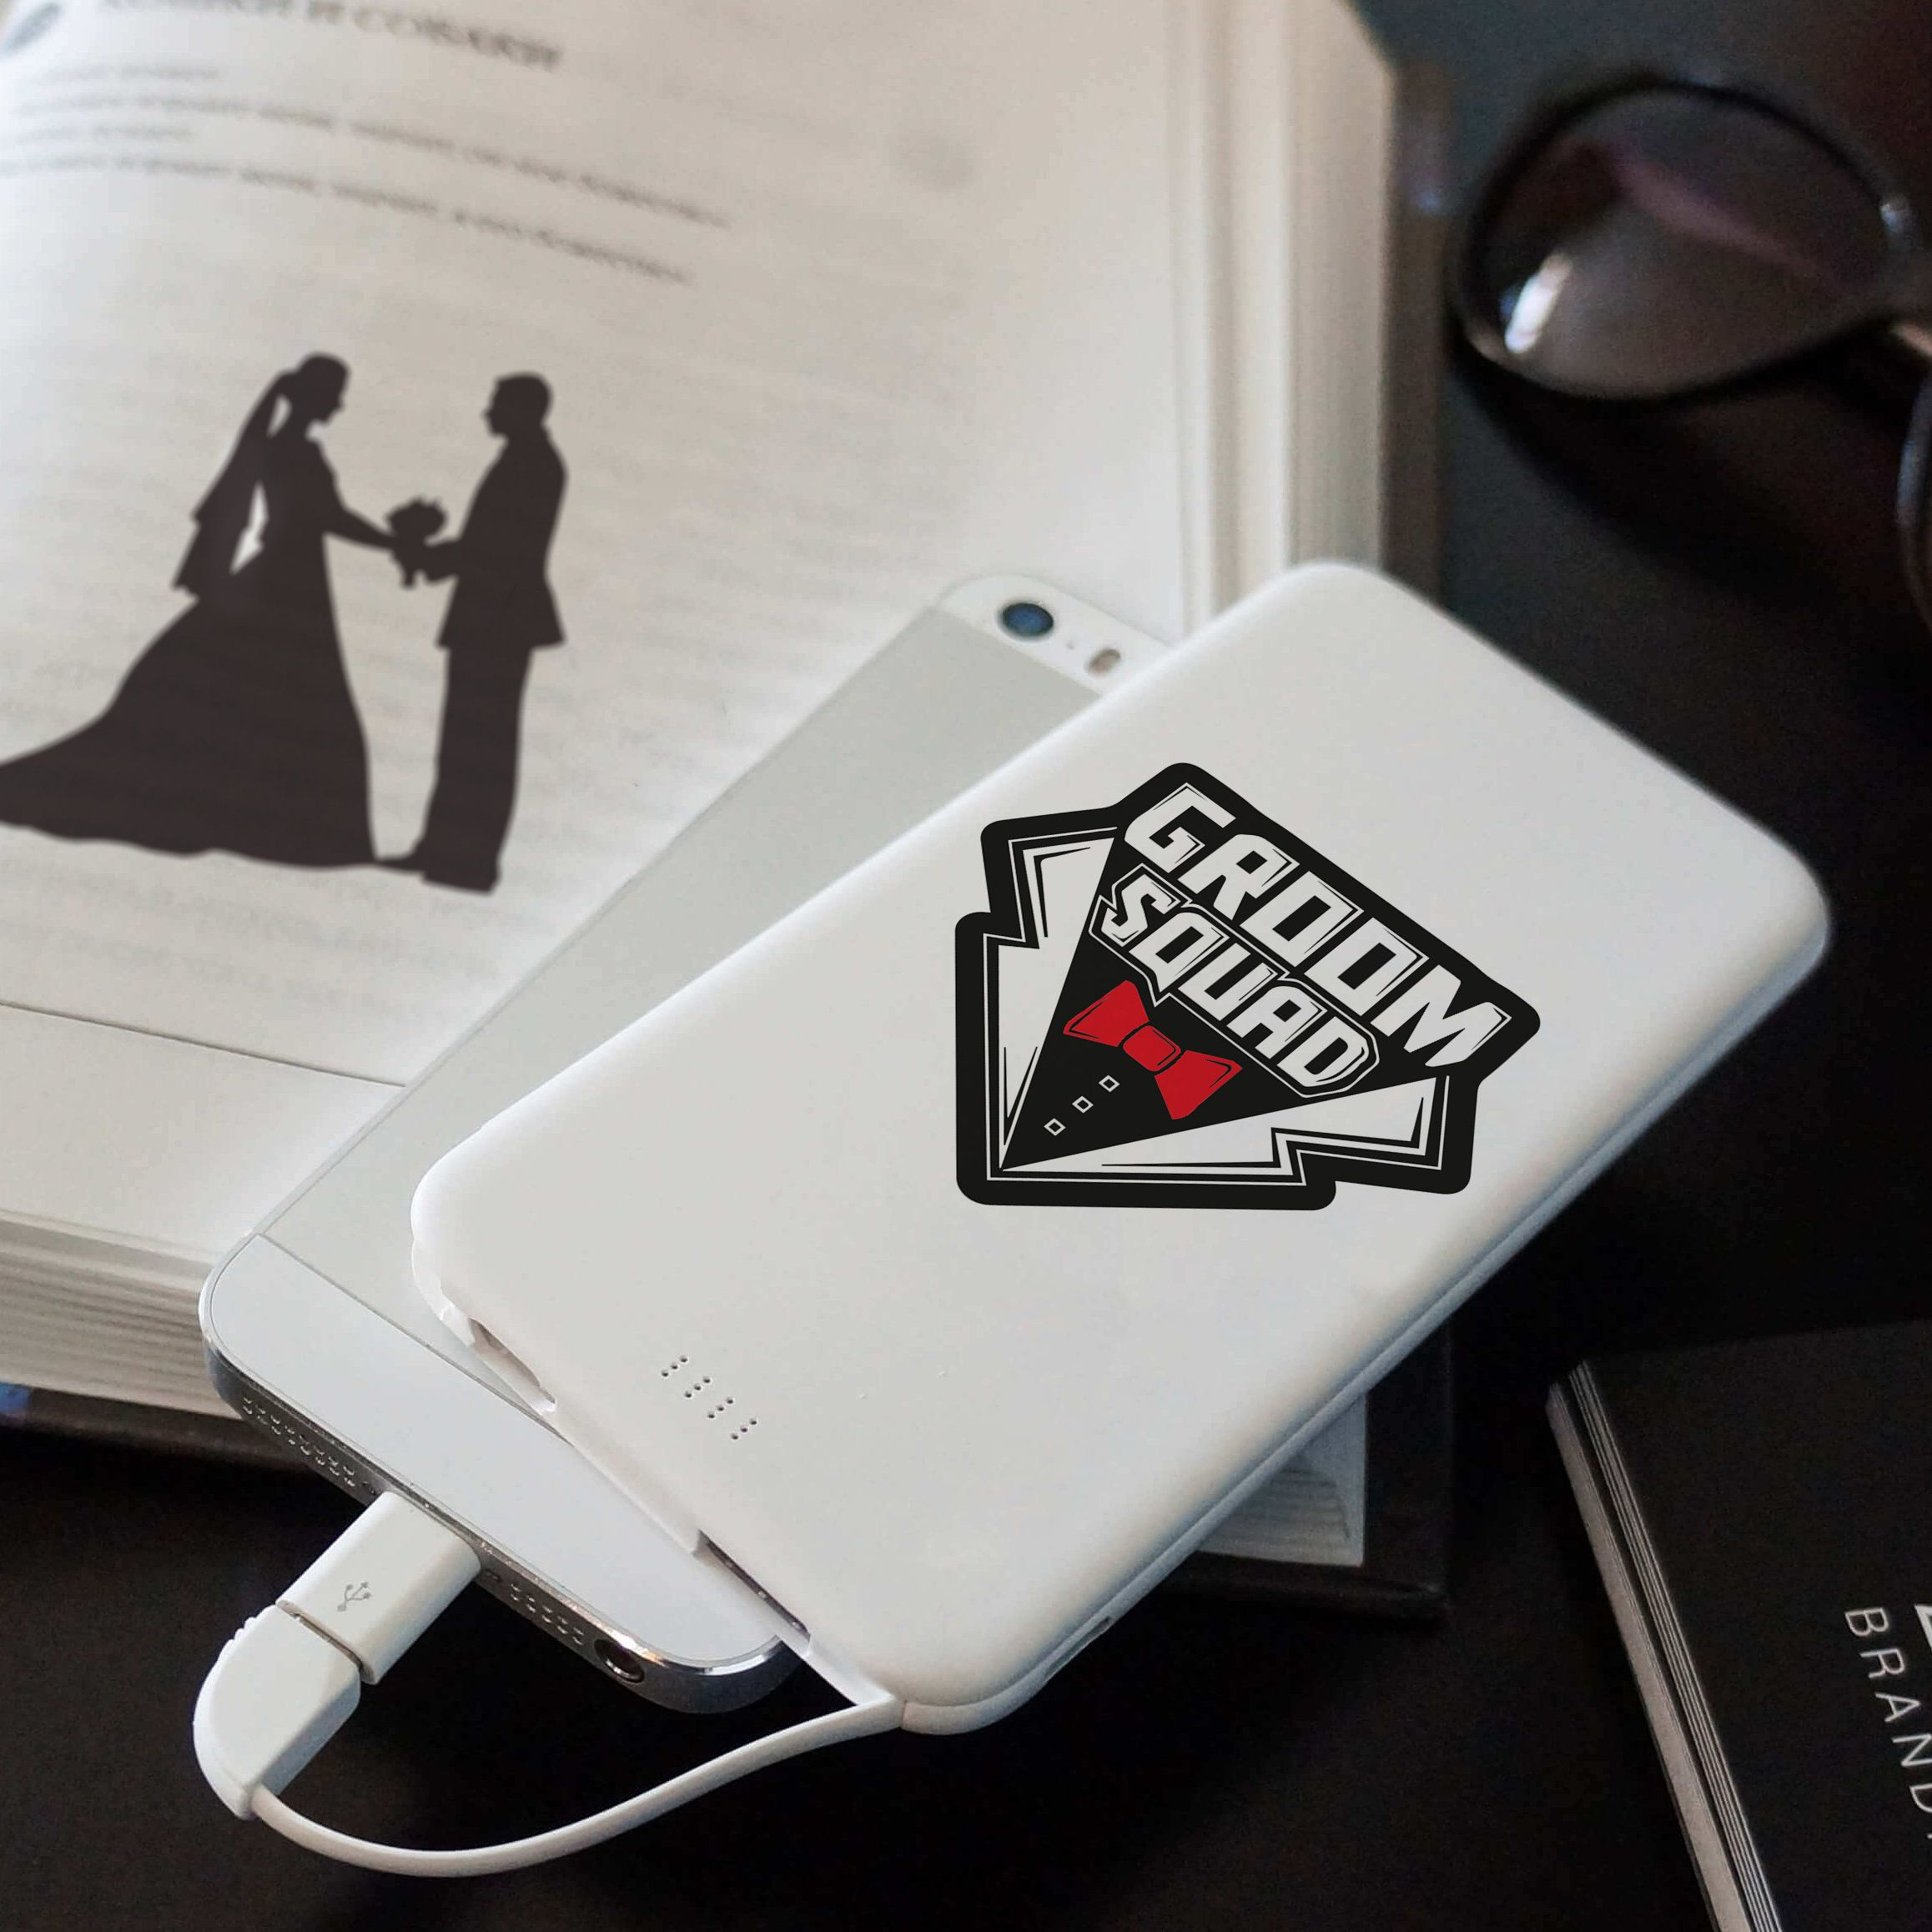 fefd3eb48da9e Wedding party custom gift for him power bank. Best man gift ...